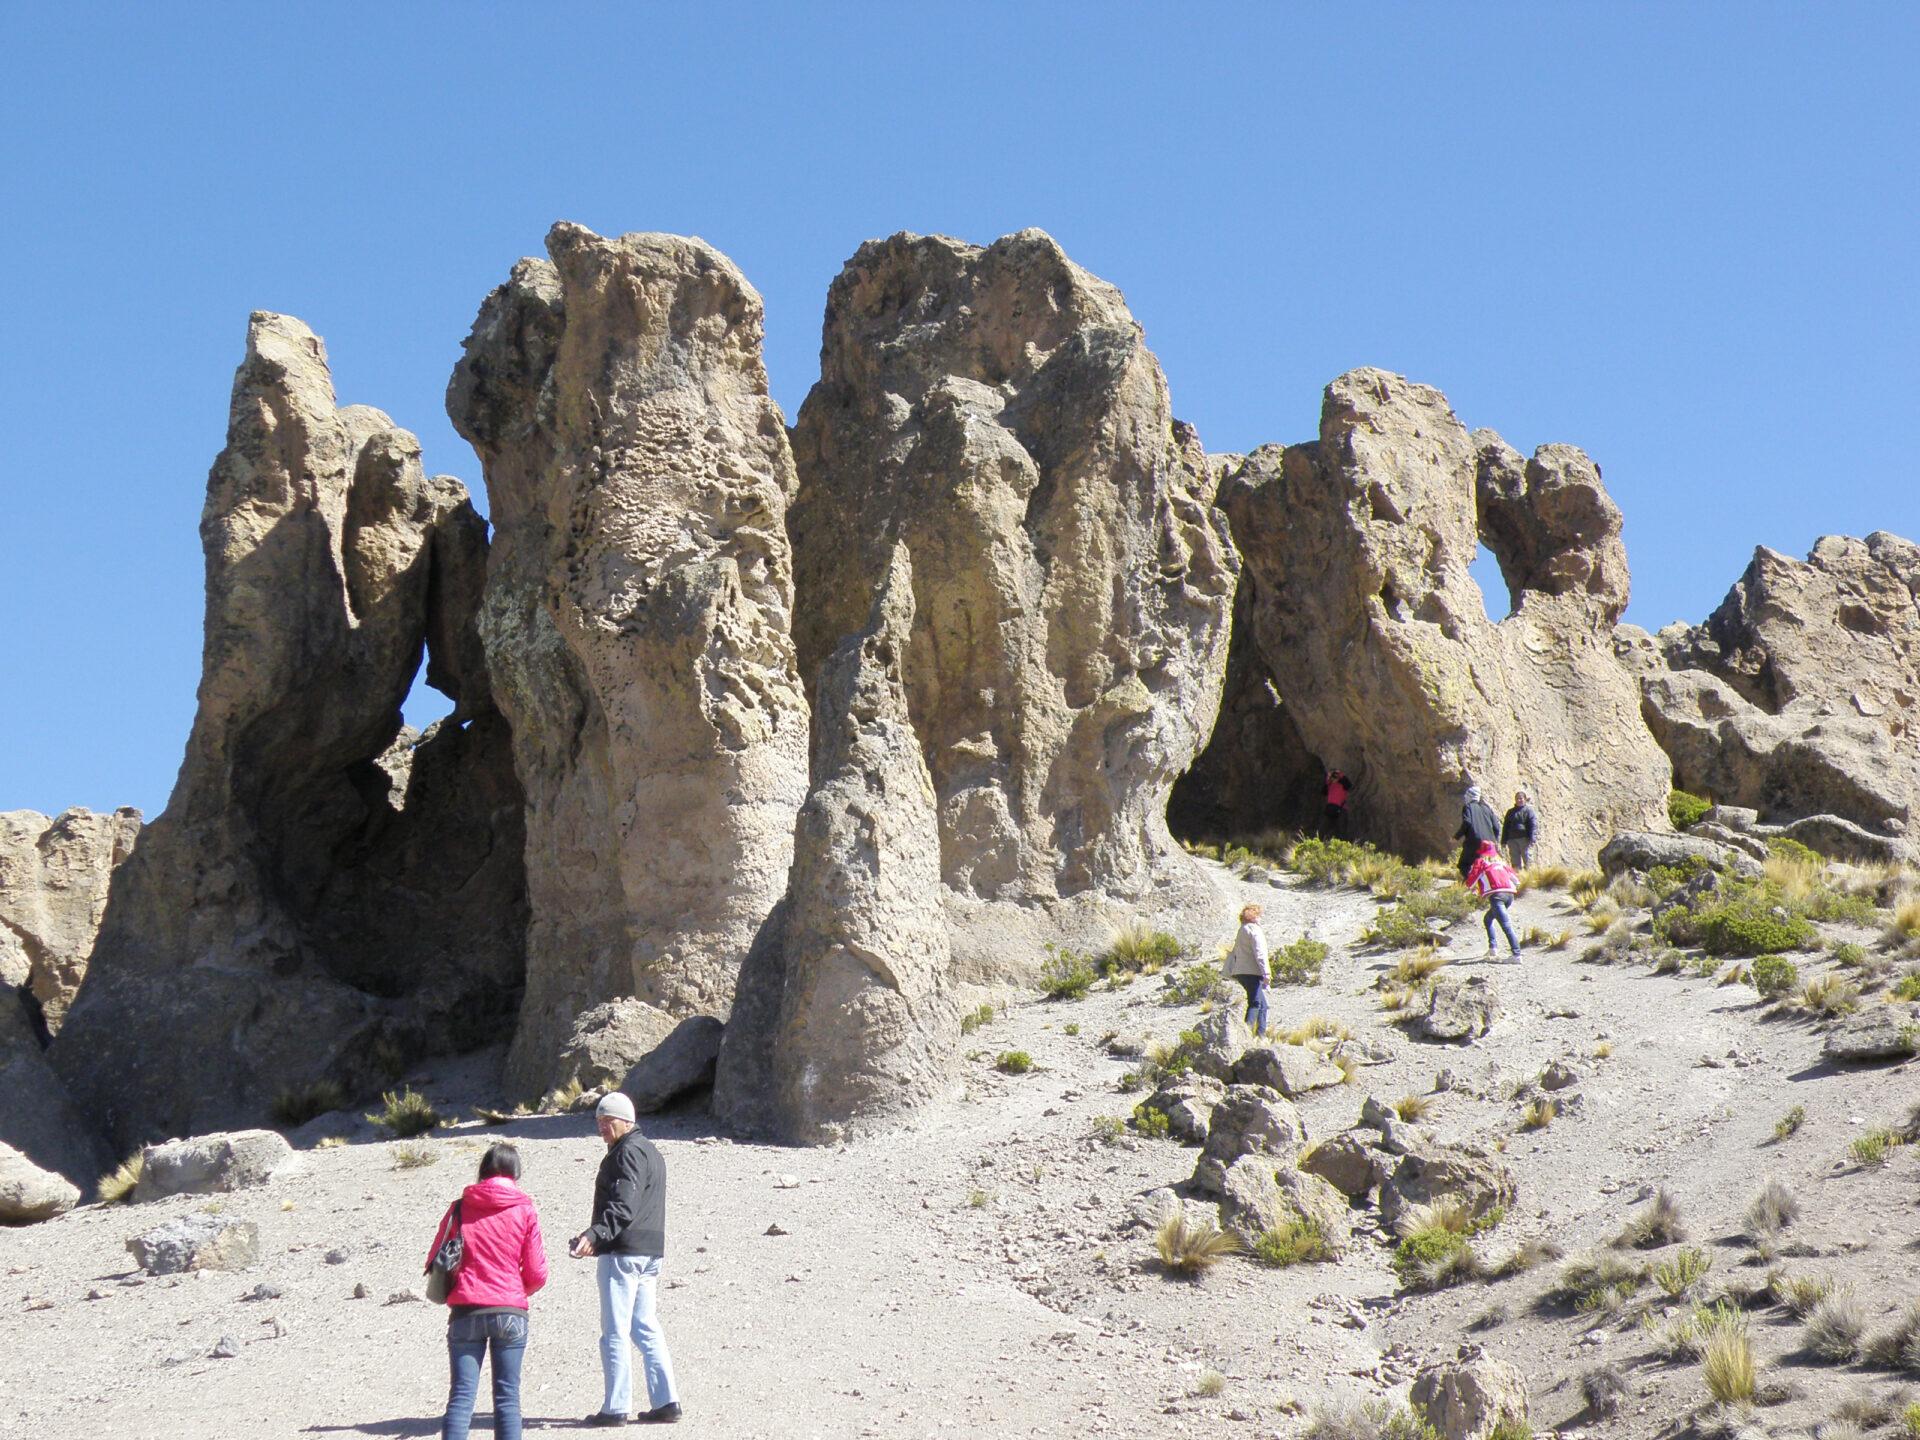 Перу: посёлок Чивай икрасавица Арекипа.